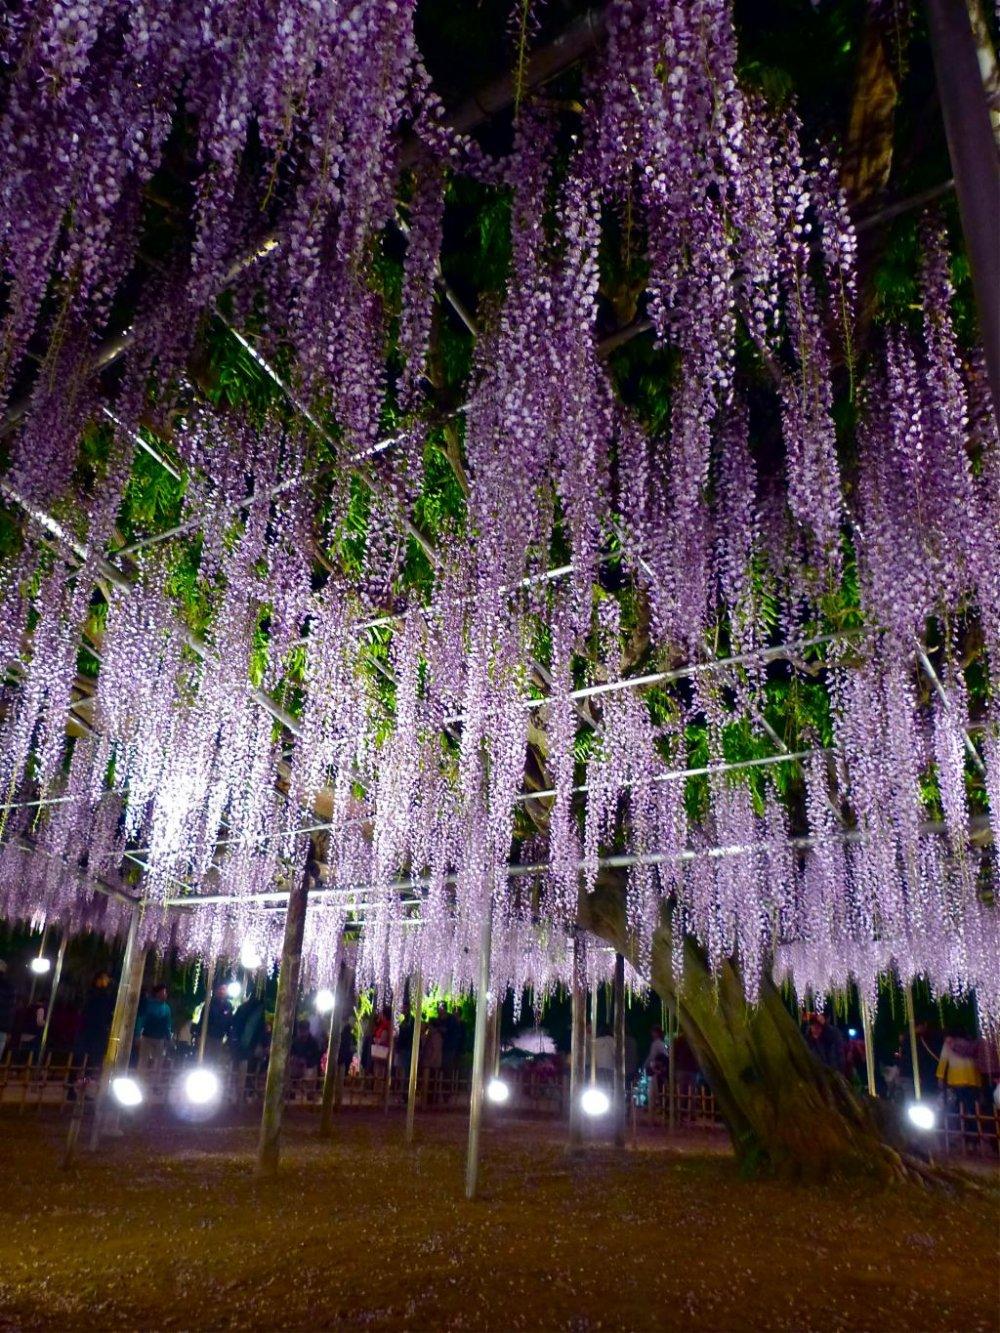 Oh-nagafuji wisteria at night